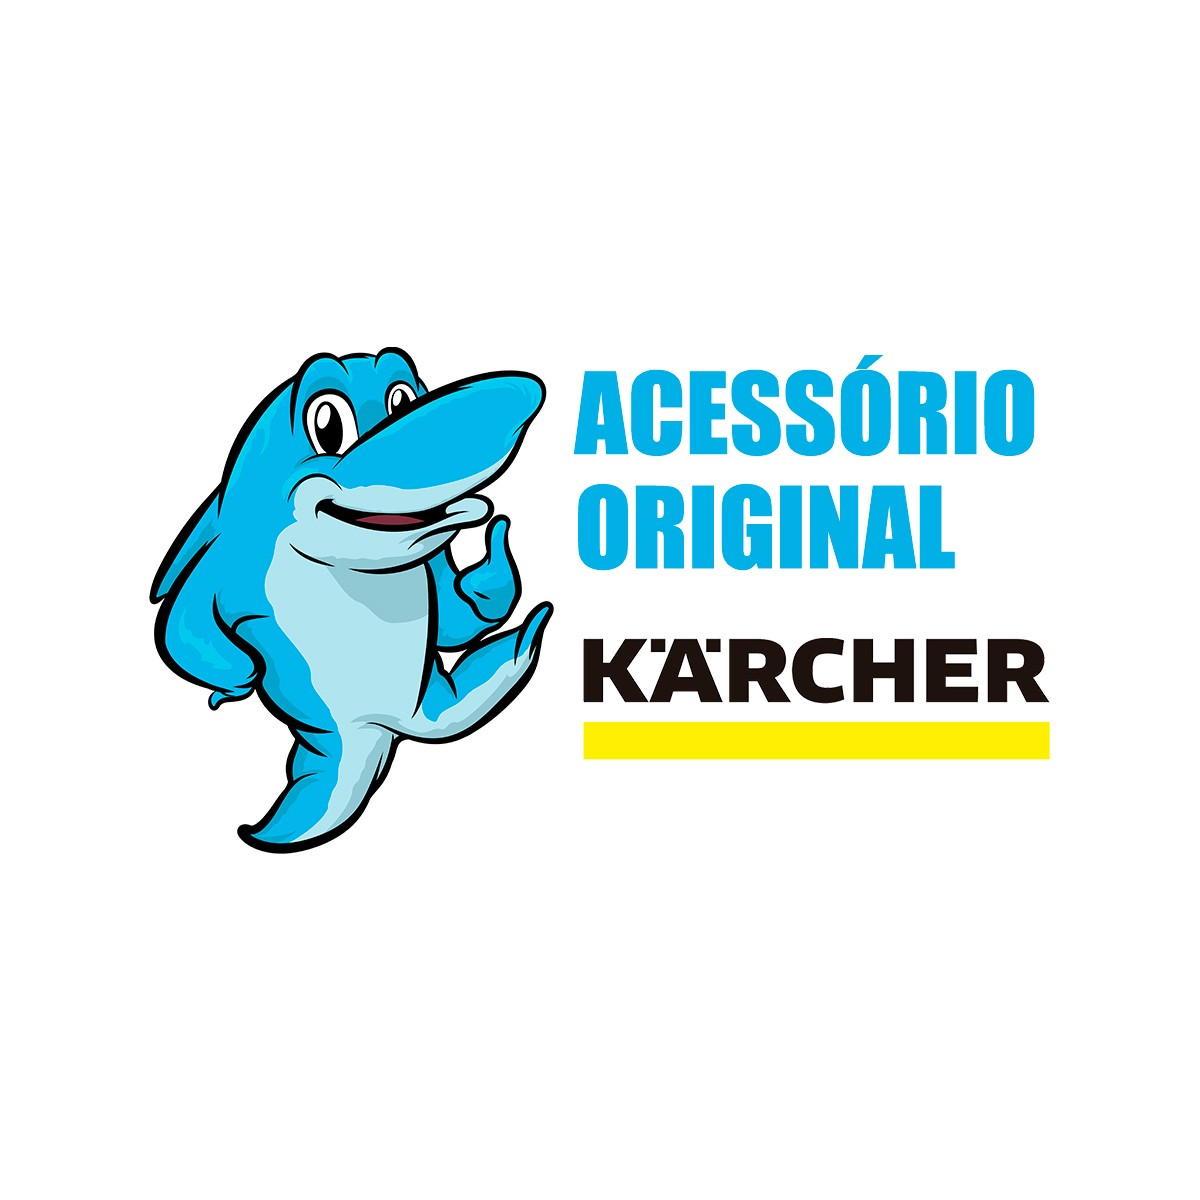 Bico Turbo Para Lavadoras Karcher HDS 800, HDS 1000, HDS 8/15, HD 10/18 MAX, HD 8/13, HD 8/15, HD 7/11-4 (220v) Original